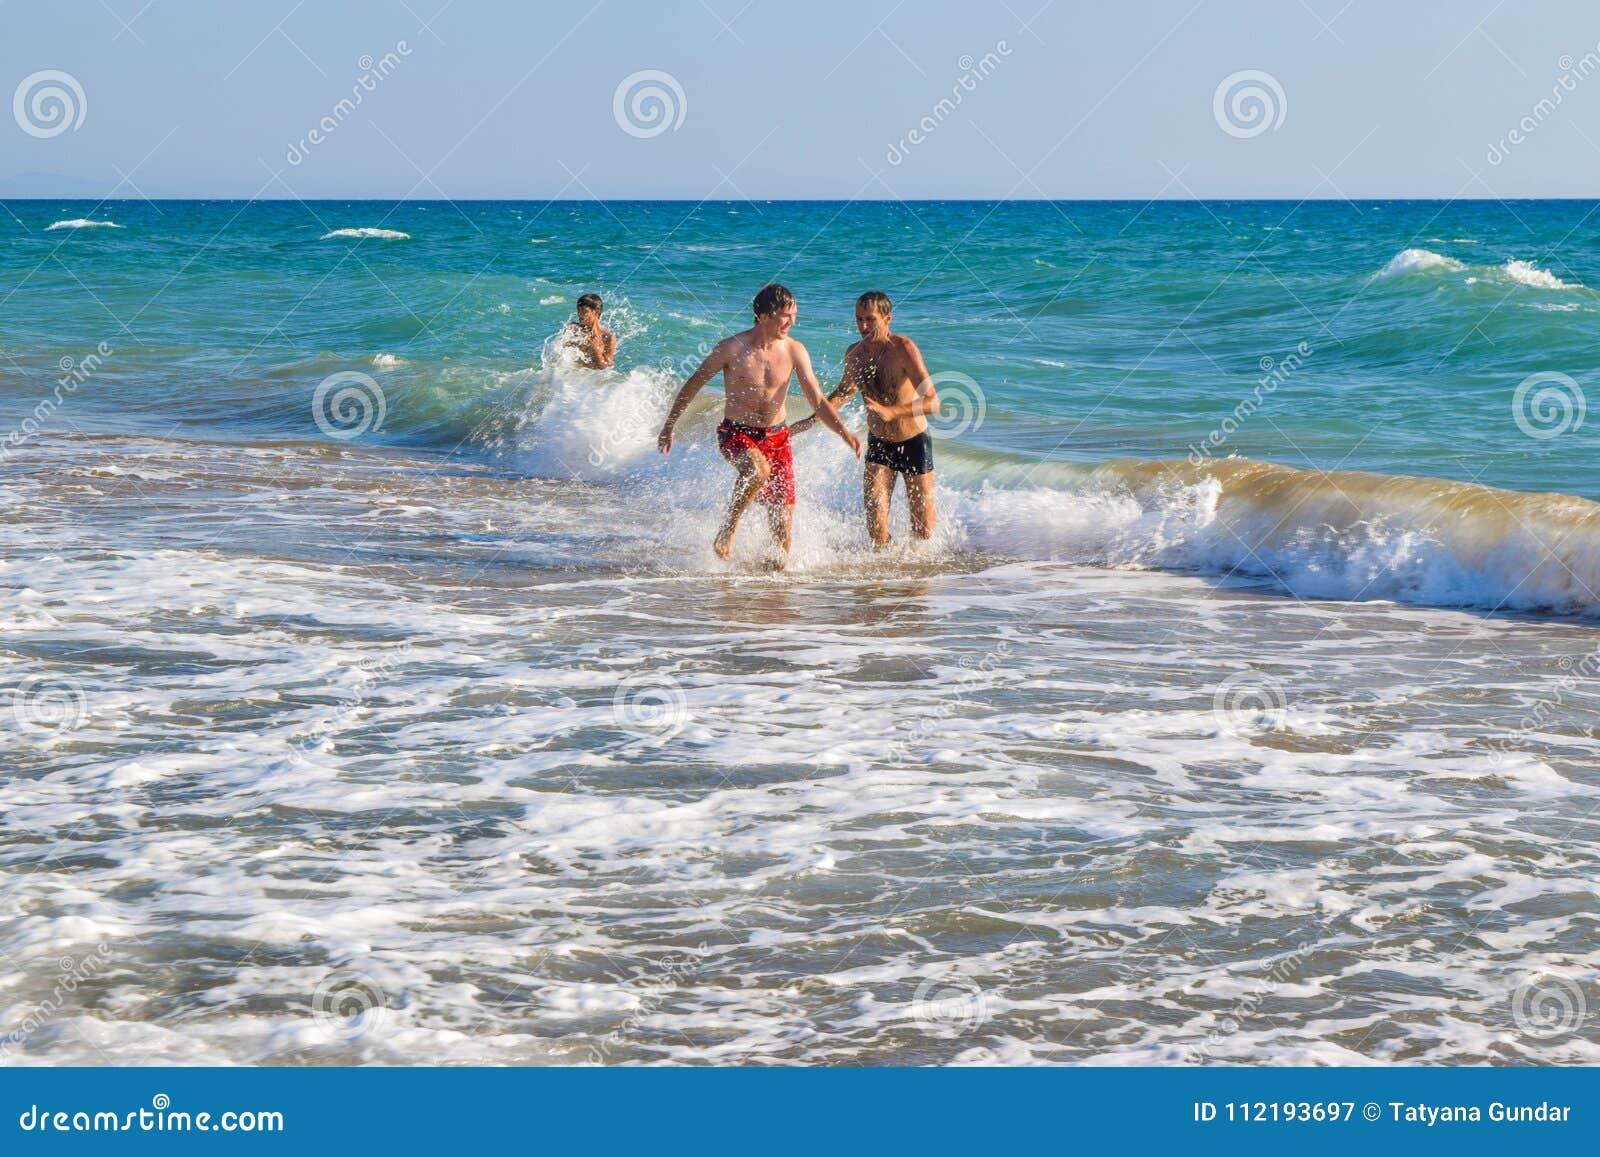 The active beach games.